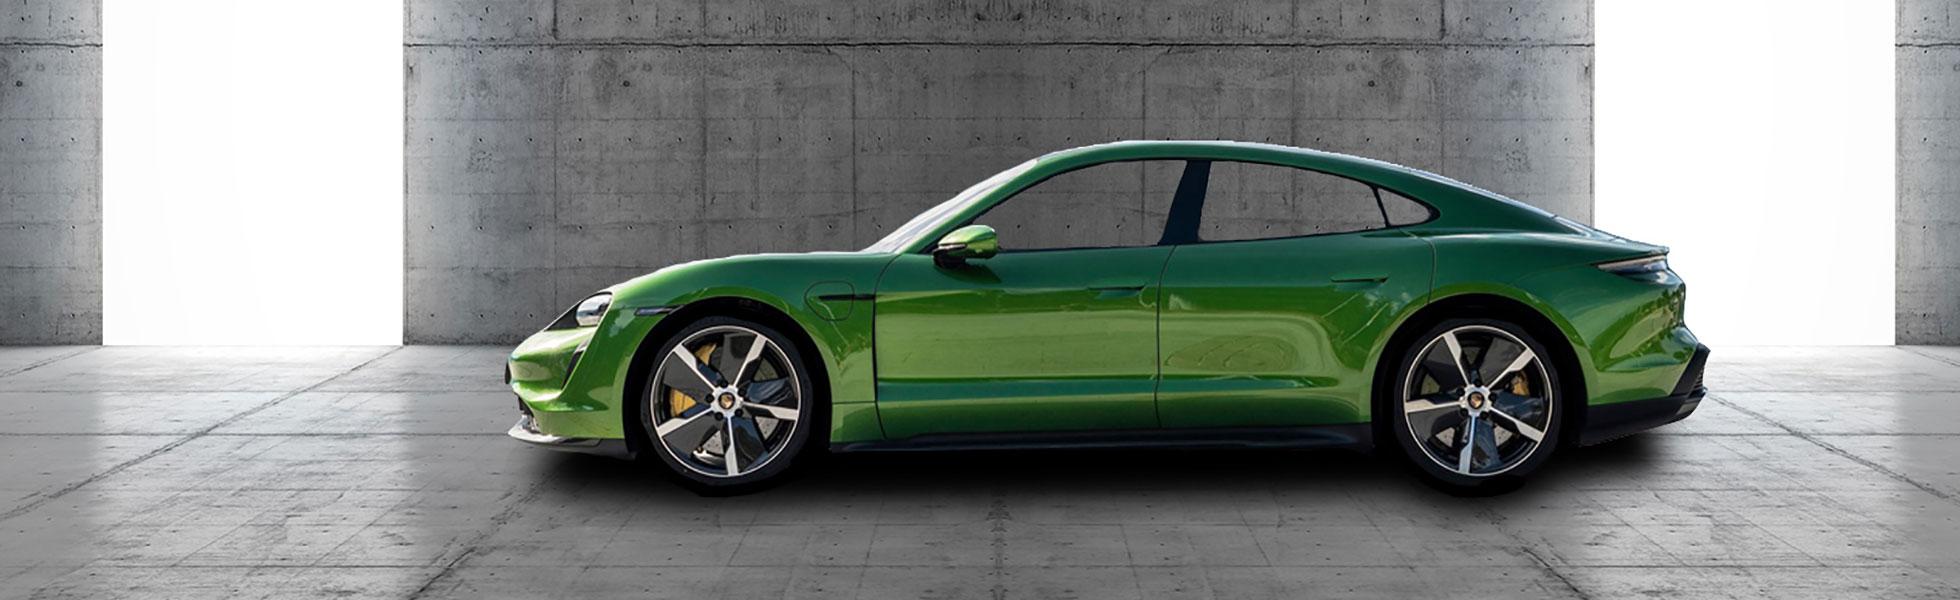 Porsche Taycan Buy Rims & Complete Wheels